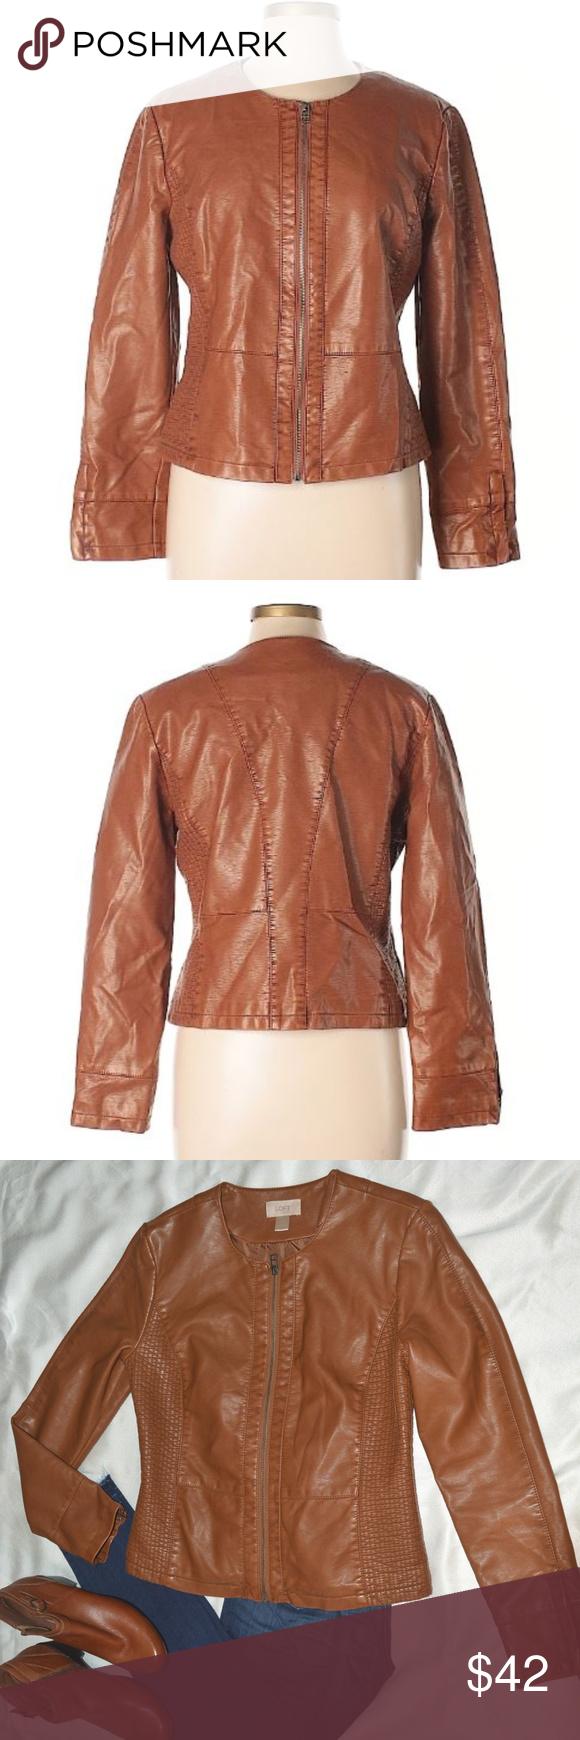 Loft Seamed Faux Leather Jacket Sleek and stylish, this